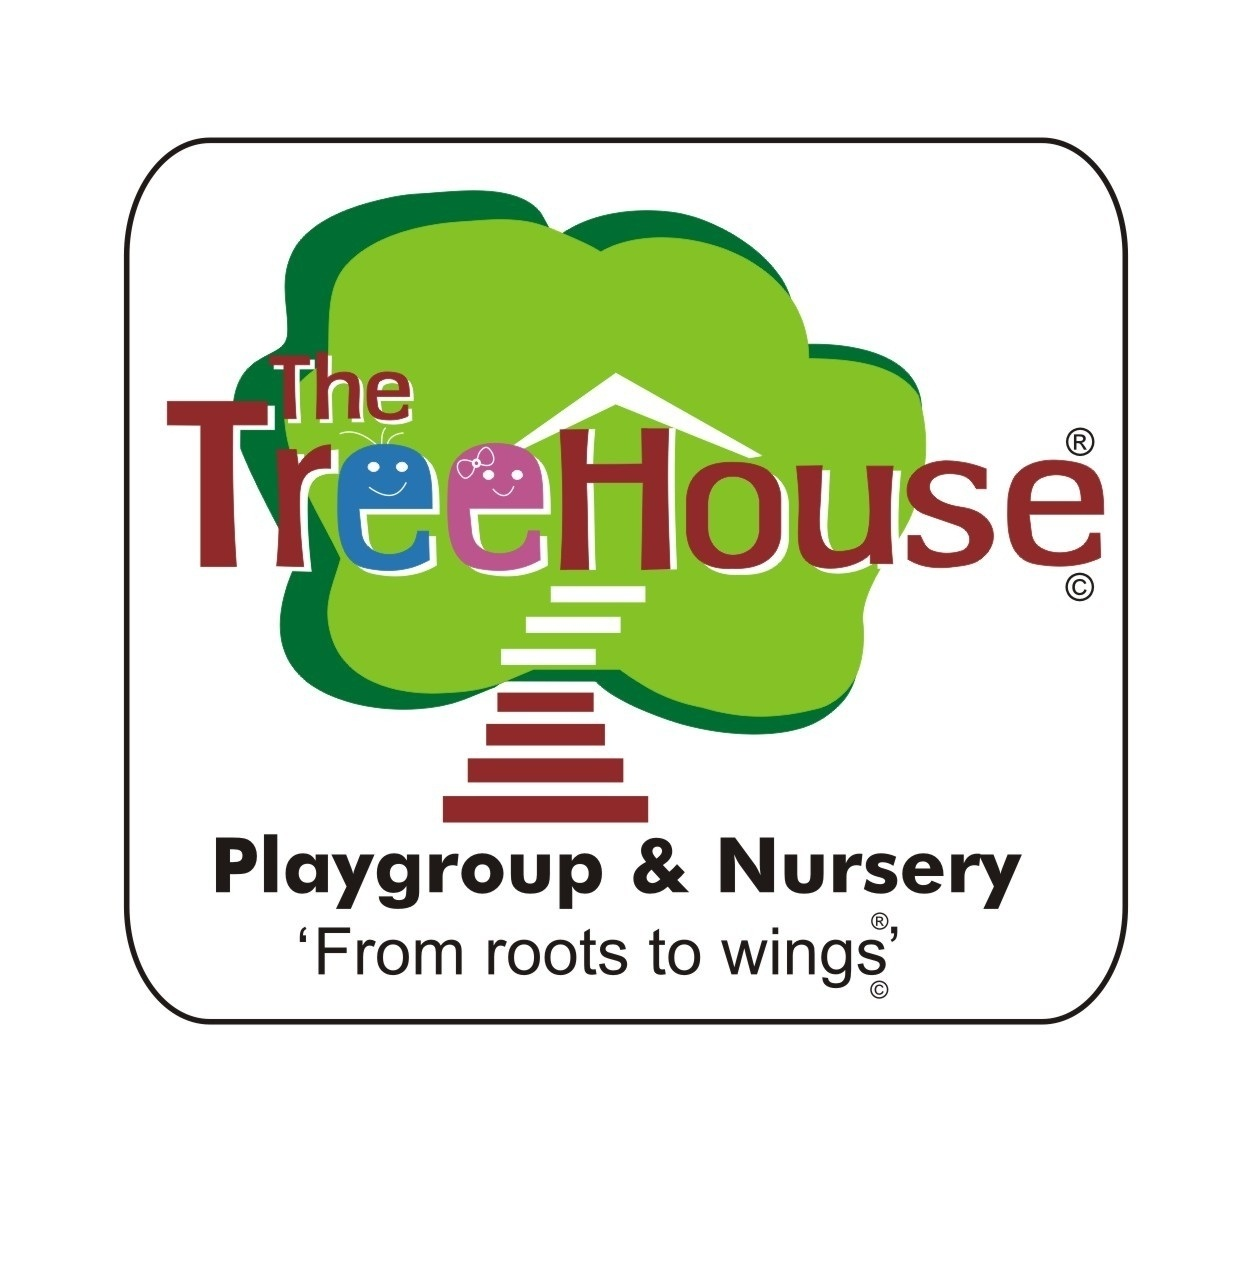 Treehouse Playgroup - Karve Nagar - Pune Image